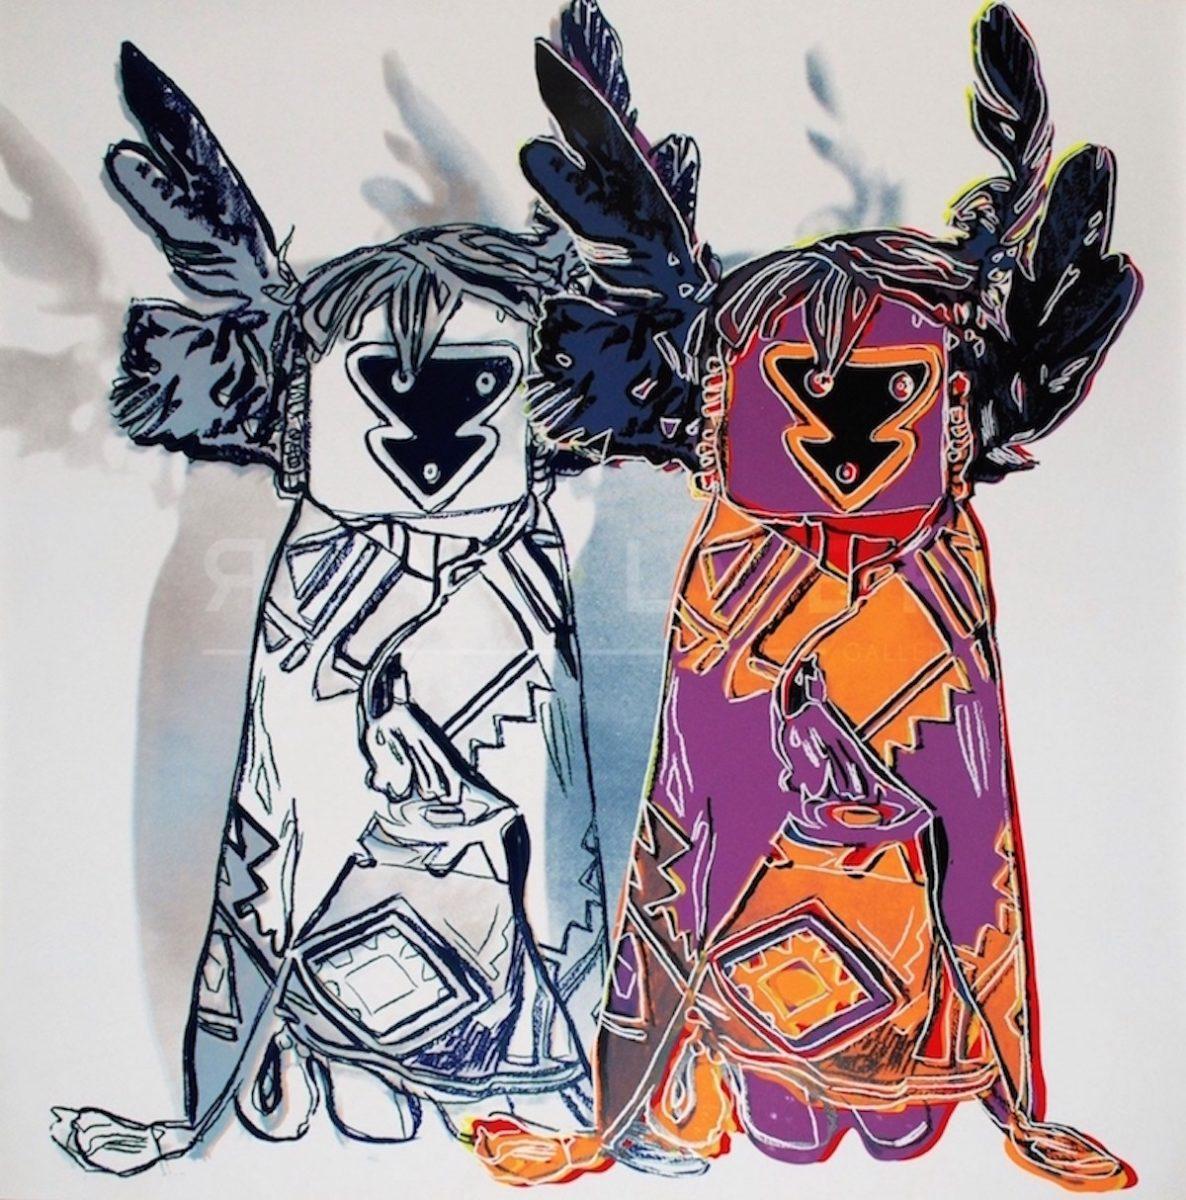 Andy Warhol - Kachina Dolls F.S. II 381 jpg